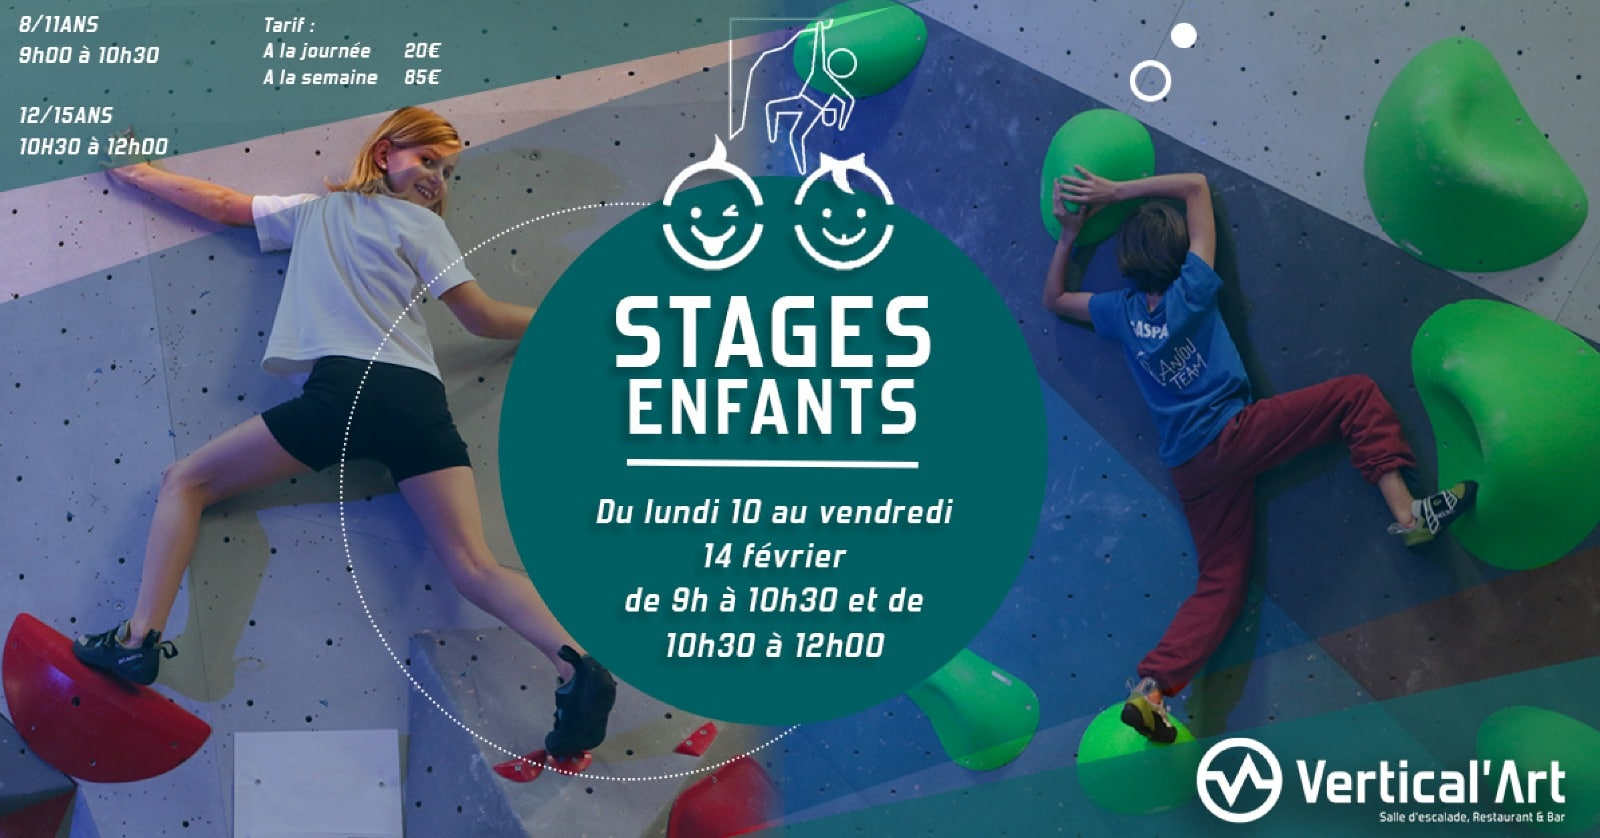 Stages enfants des vacances d'Hiver à vertical'art rungis - VA rungis -Val de marne - Salle d'escalade en Ile de France -Stages d'escalades 8_15ans à Vertical'Art Rungis-